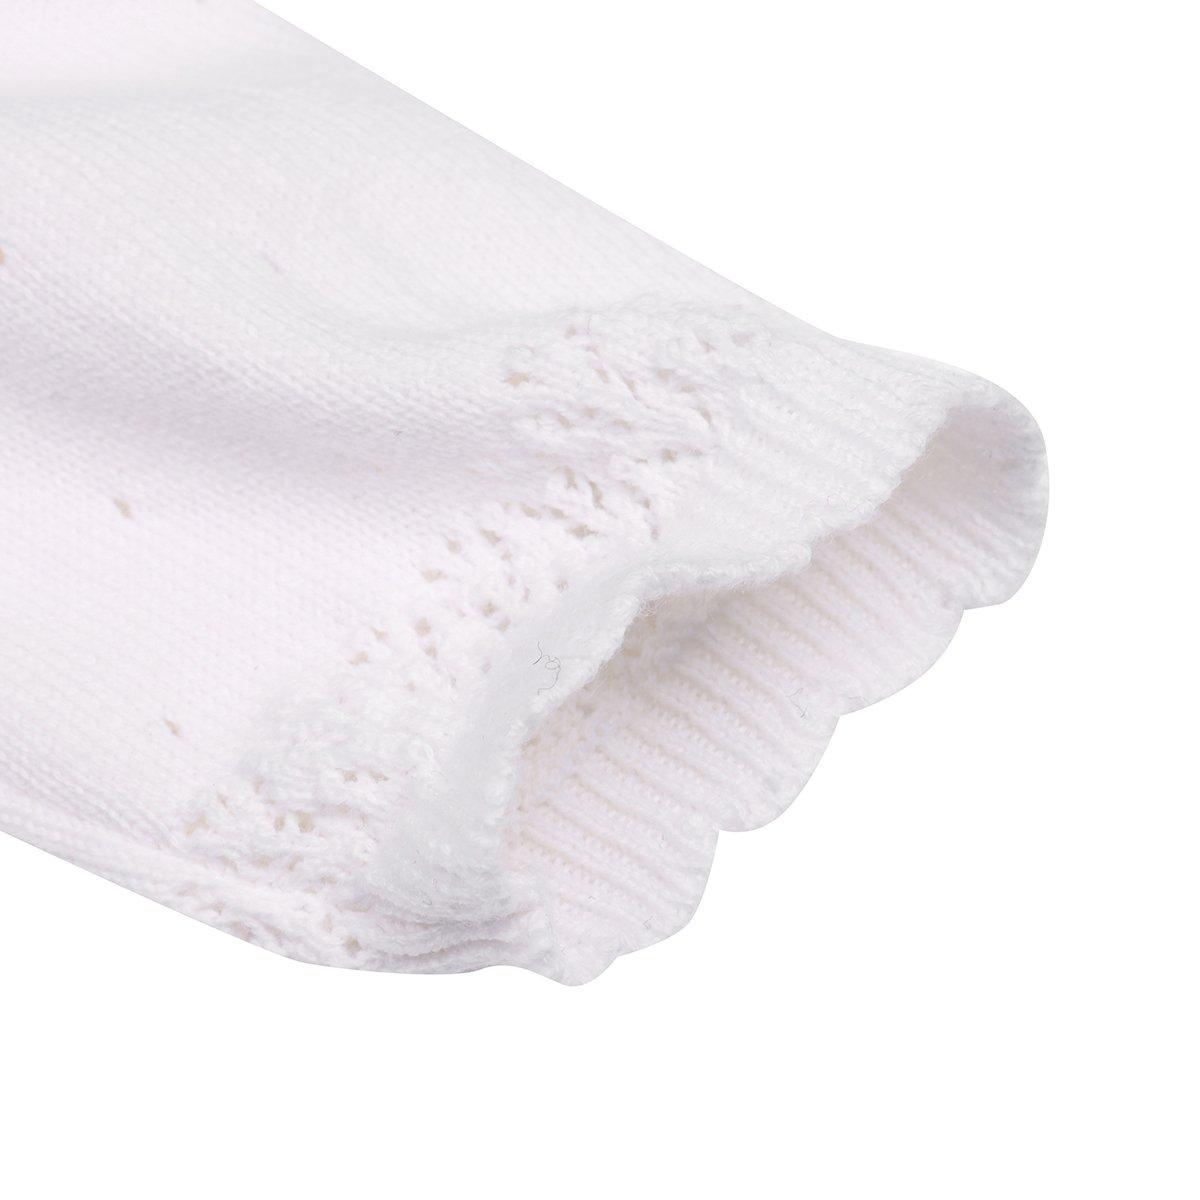 zdhoor Baby Girls Knit Long Sleeve Princess Bolero Shrug Lace Flower Short Cardigan Wedding Party Sweater